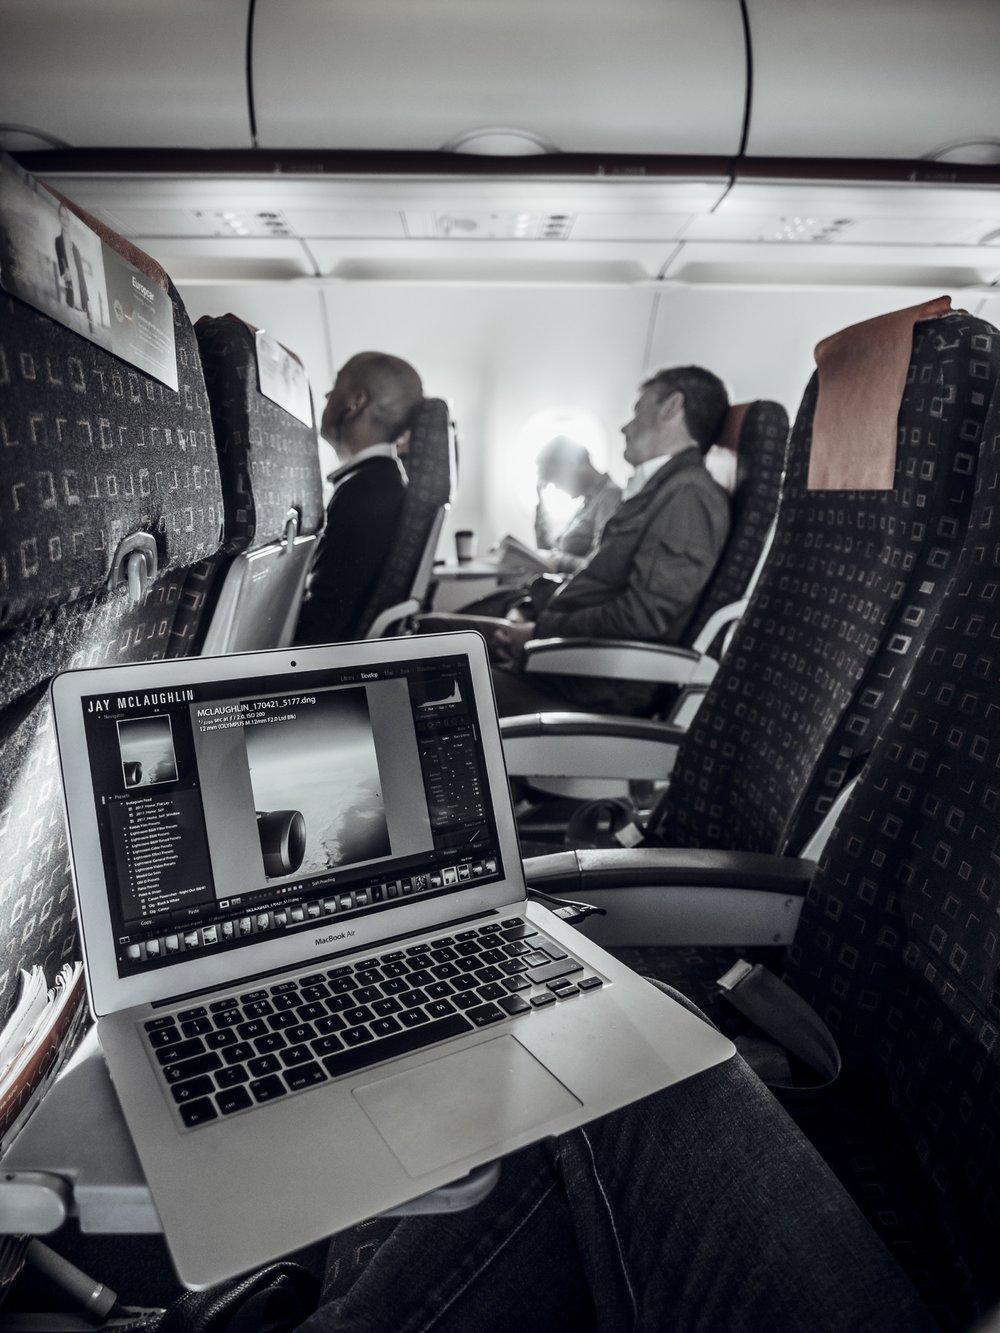 Macbook Air Laptop Adobe Lightroom EasyJet Plane Airplane Aeroplane Flight Travel Editing Photography Photos